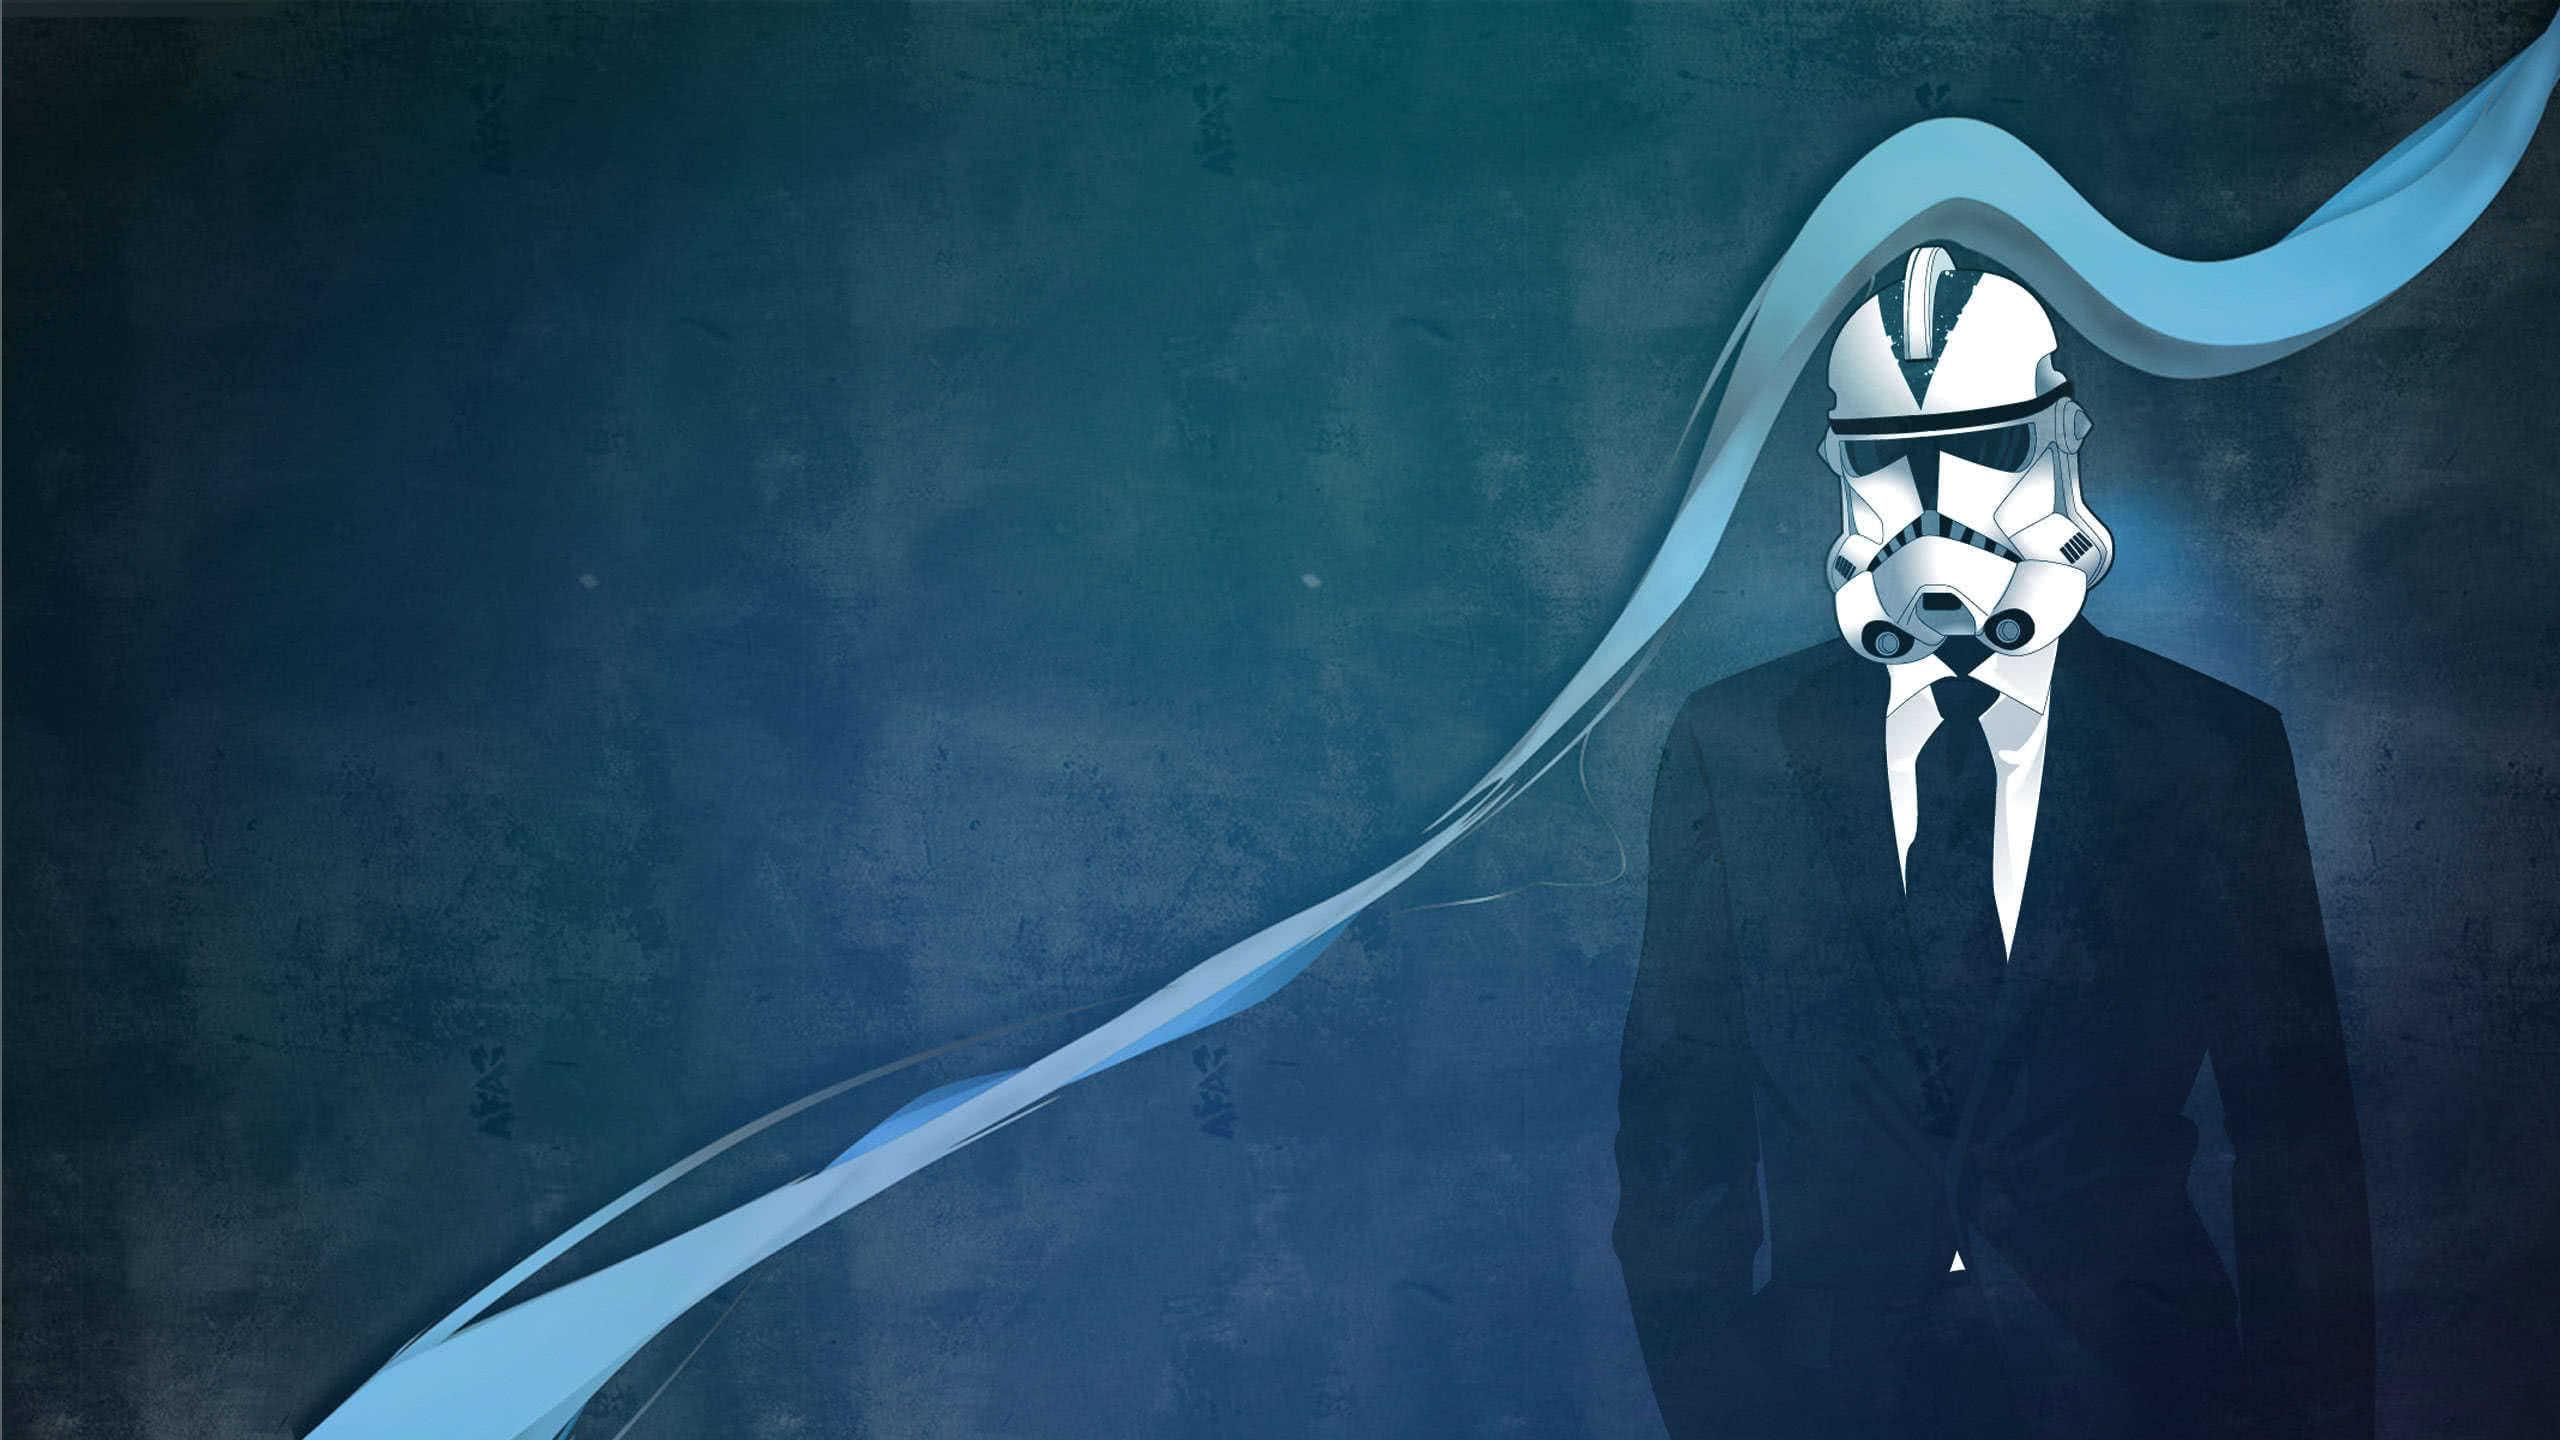 stormtrooper suit wqhd 1440p wallpaper